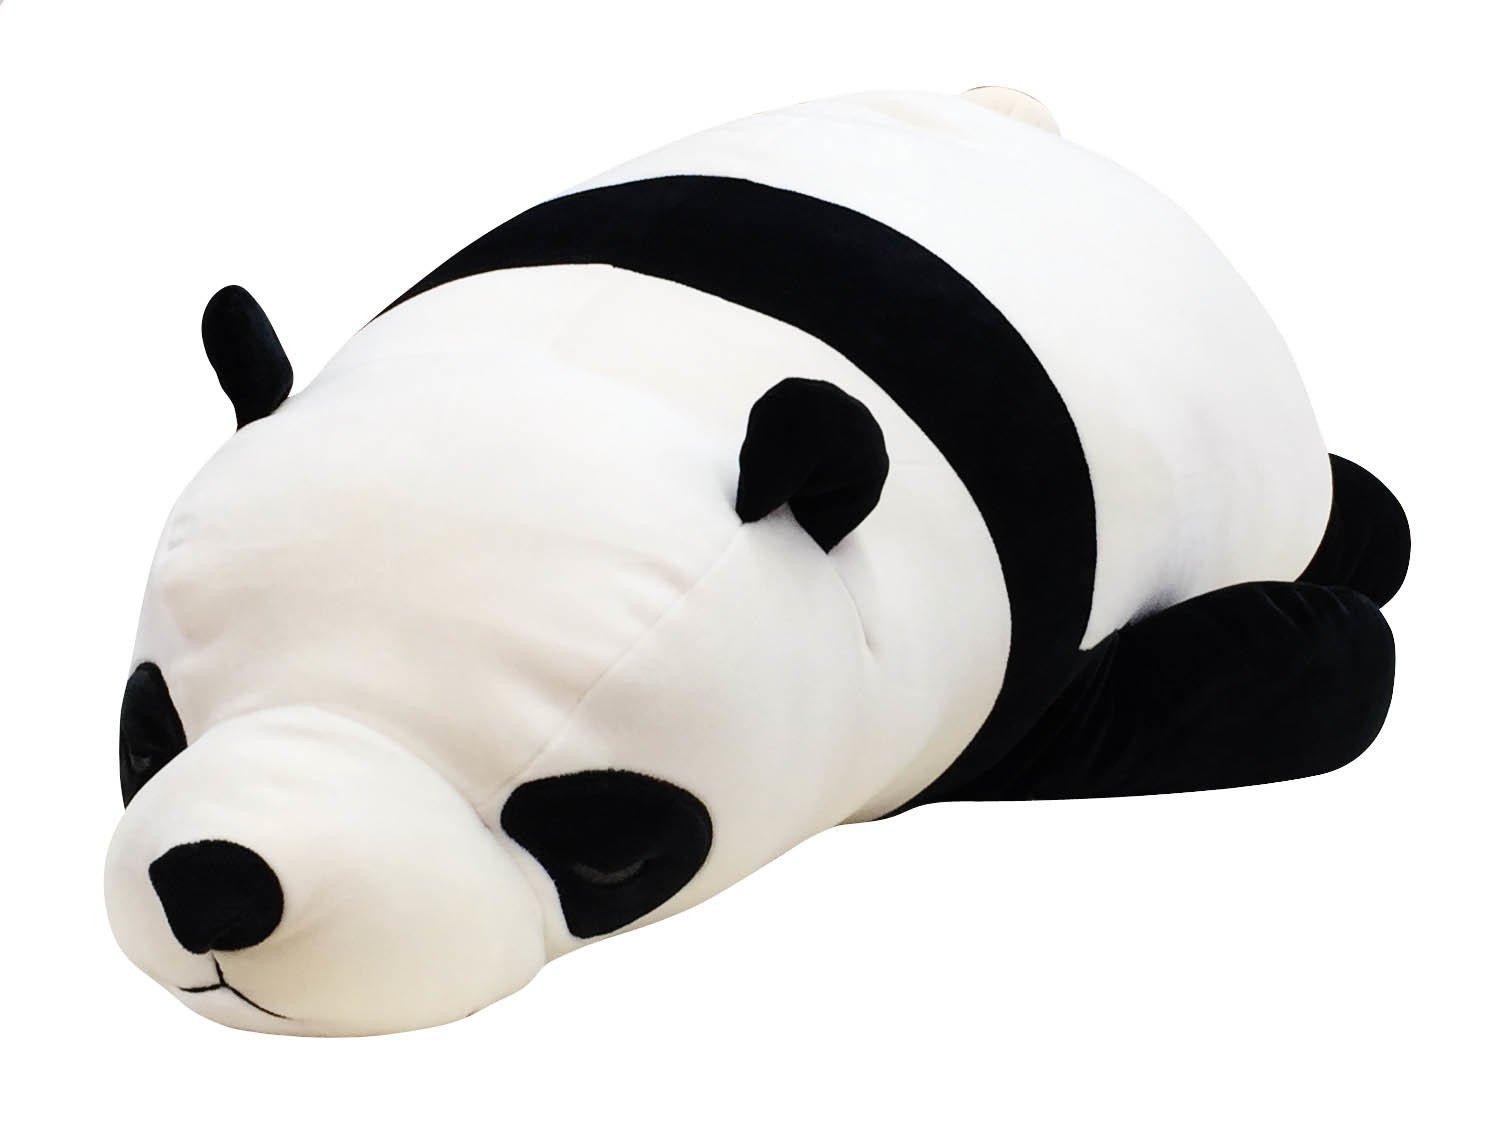 LivHeart Premium Nemu Nemu Super Soft Body Pillow Hug Pillow BIG Panda (L)